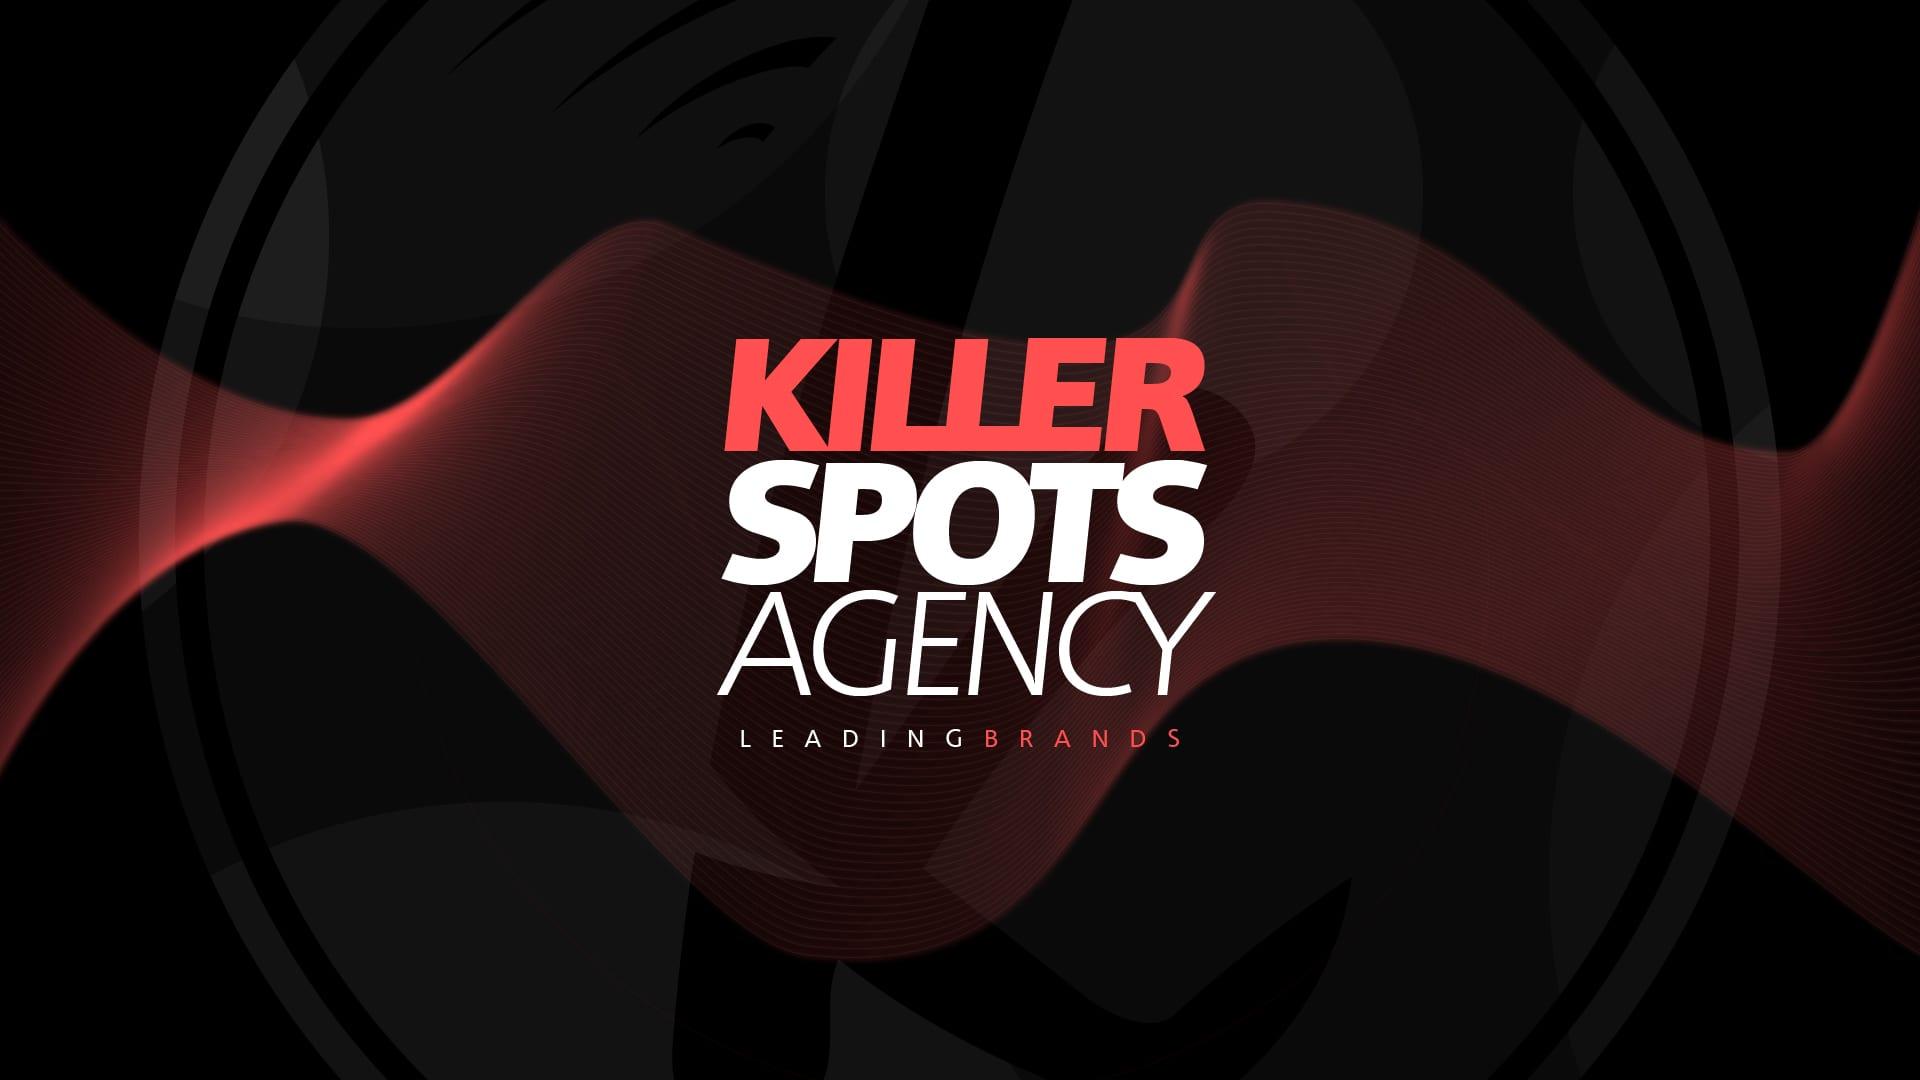 killerspots agency